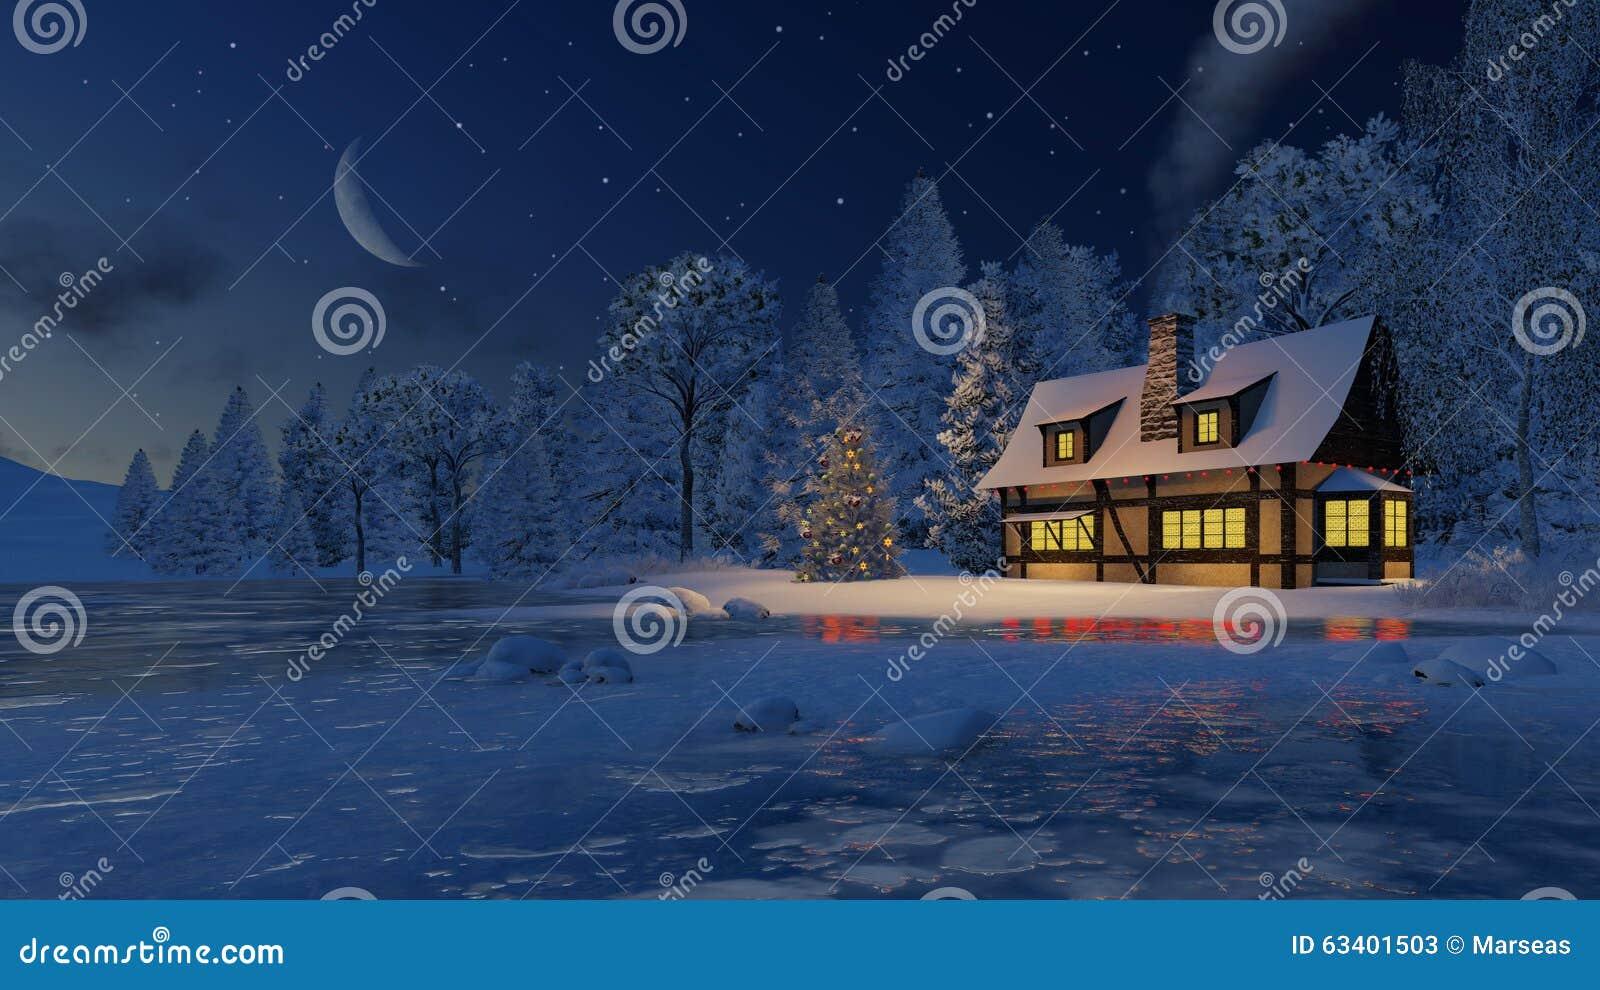 Illuminated House And Christmas Tree At Moonlight Night